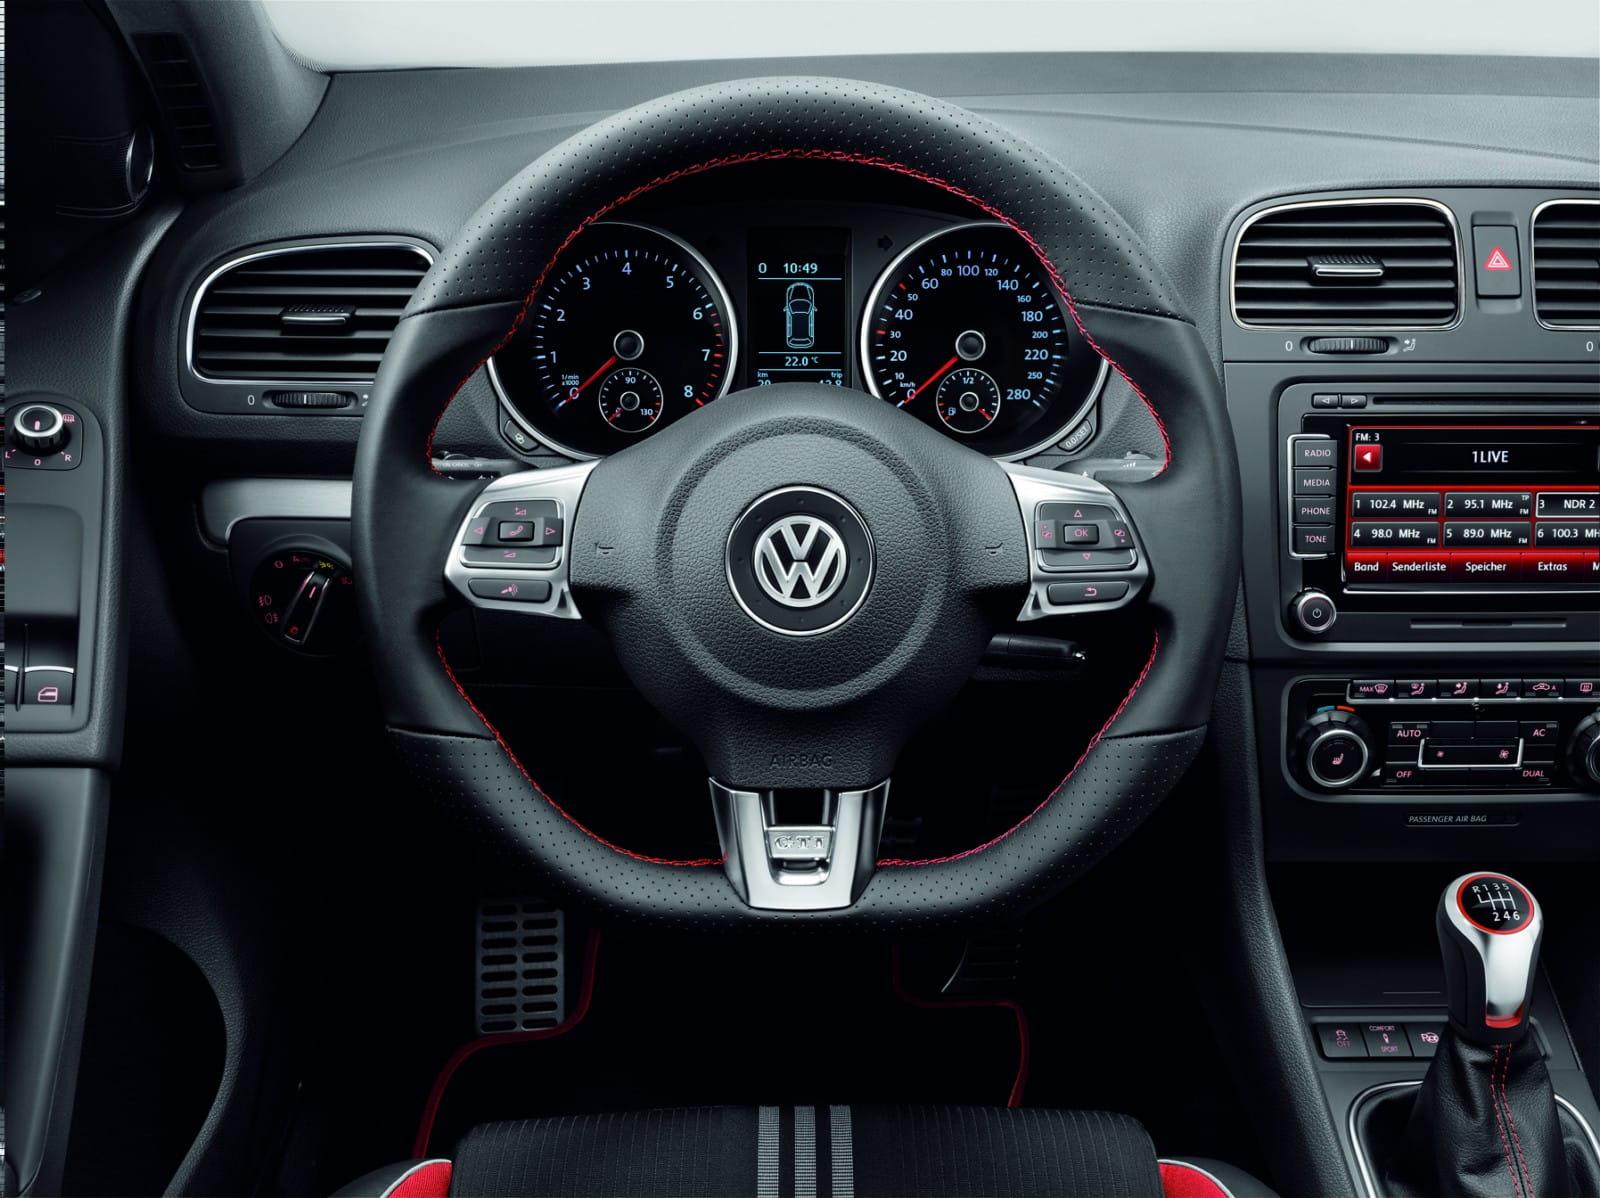 Dar a luz vecino Hora  Edicion limitado golf gti vi adidas - Foro General - Club VW Golf España